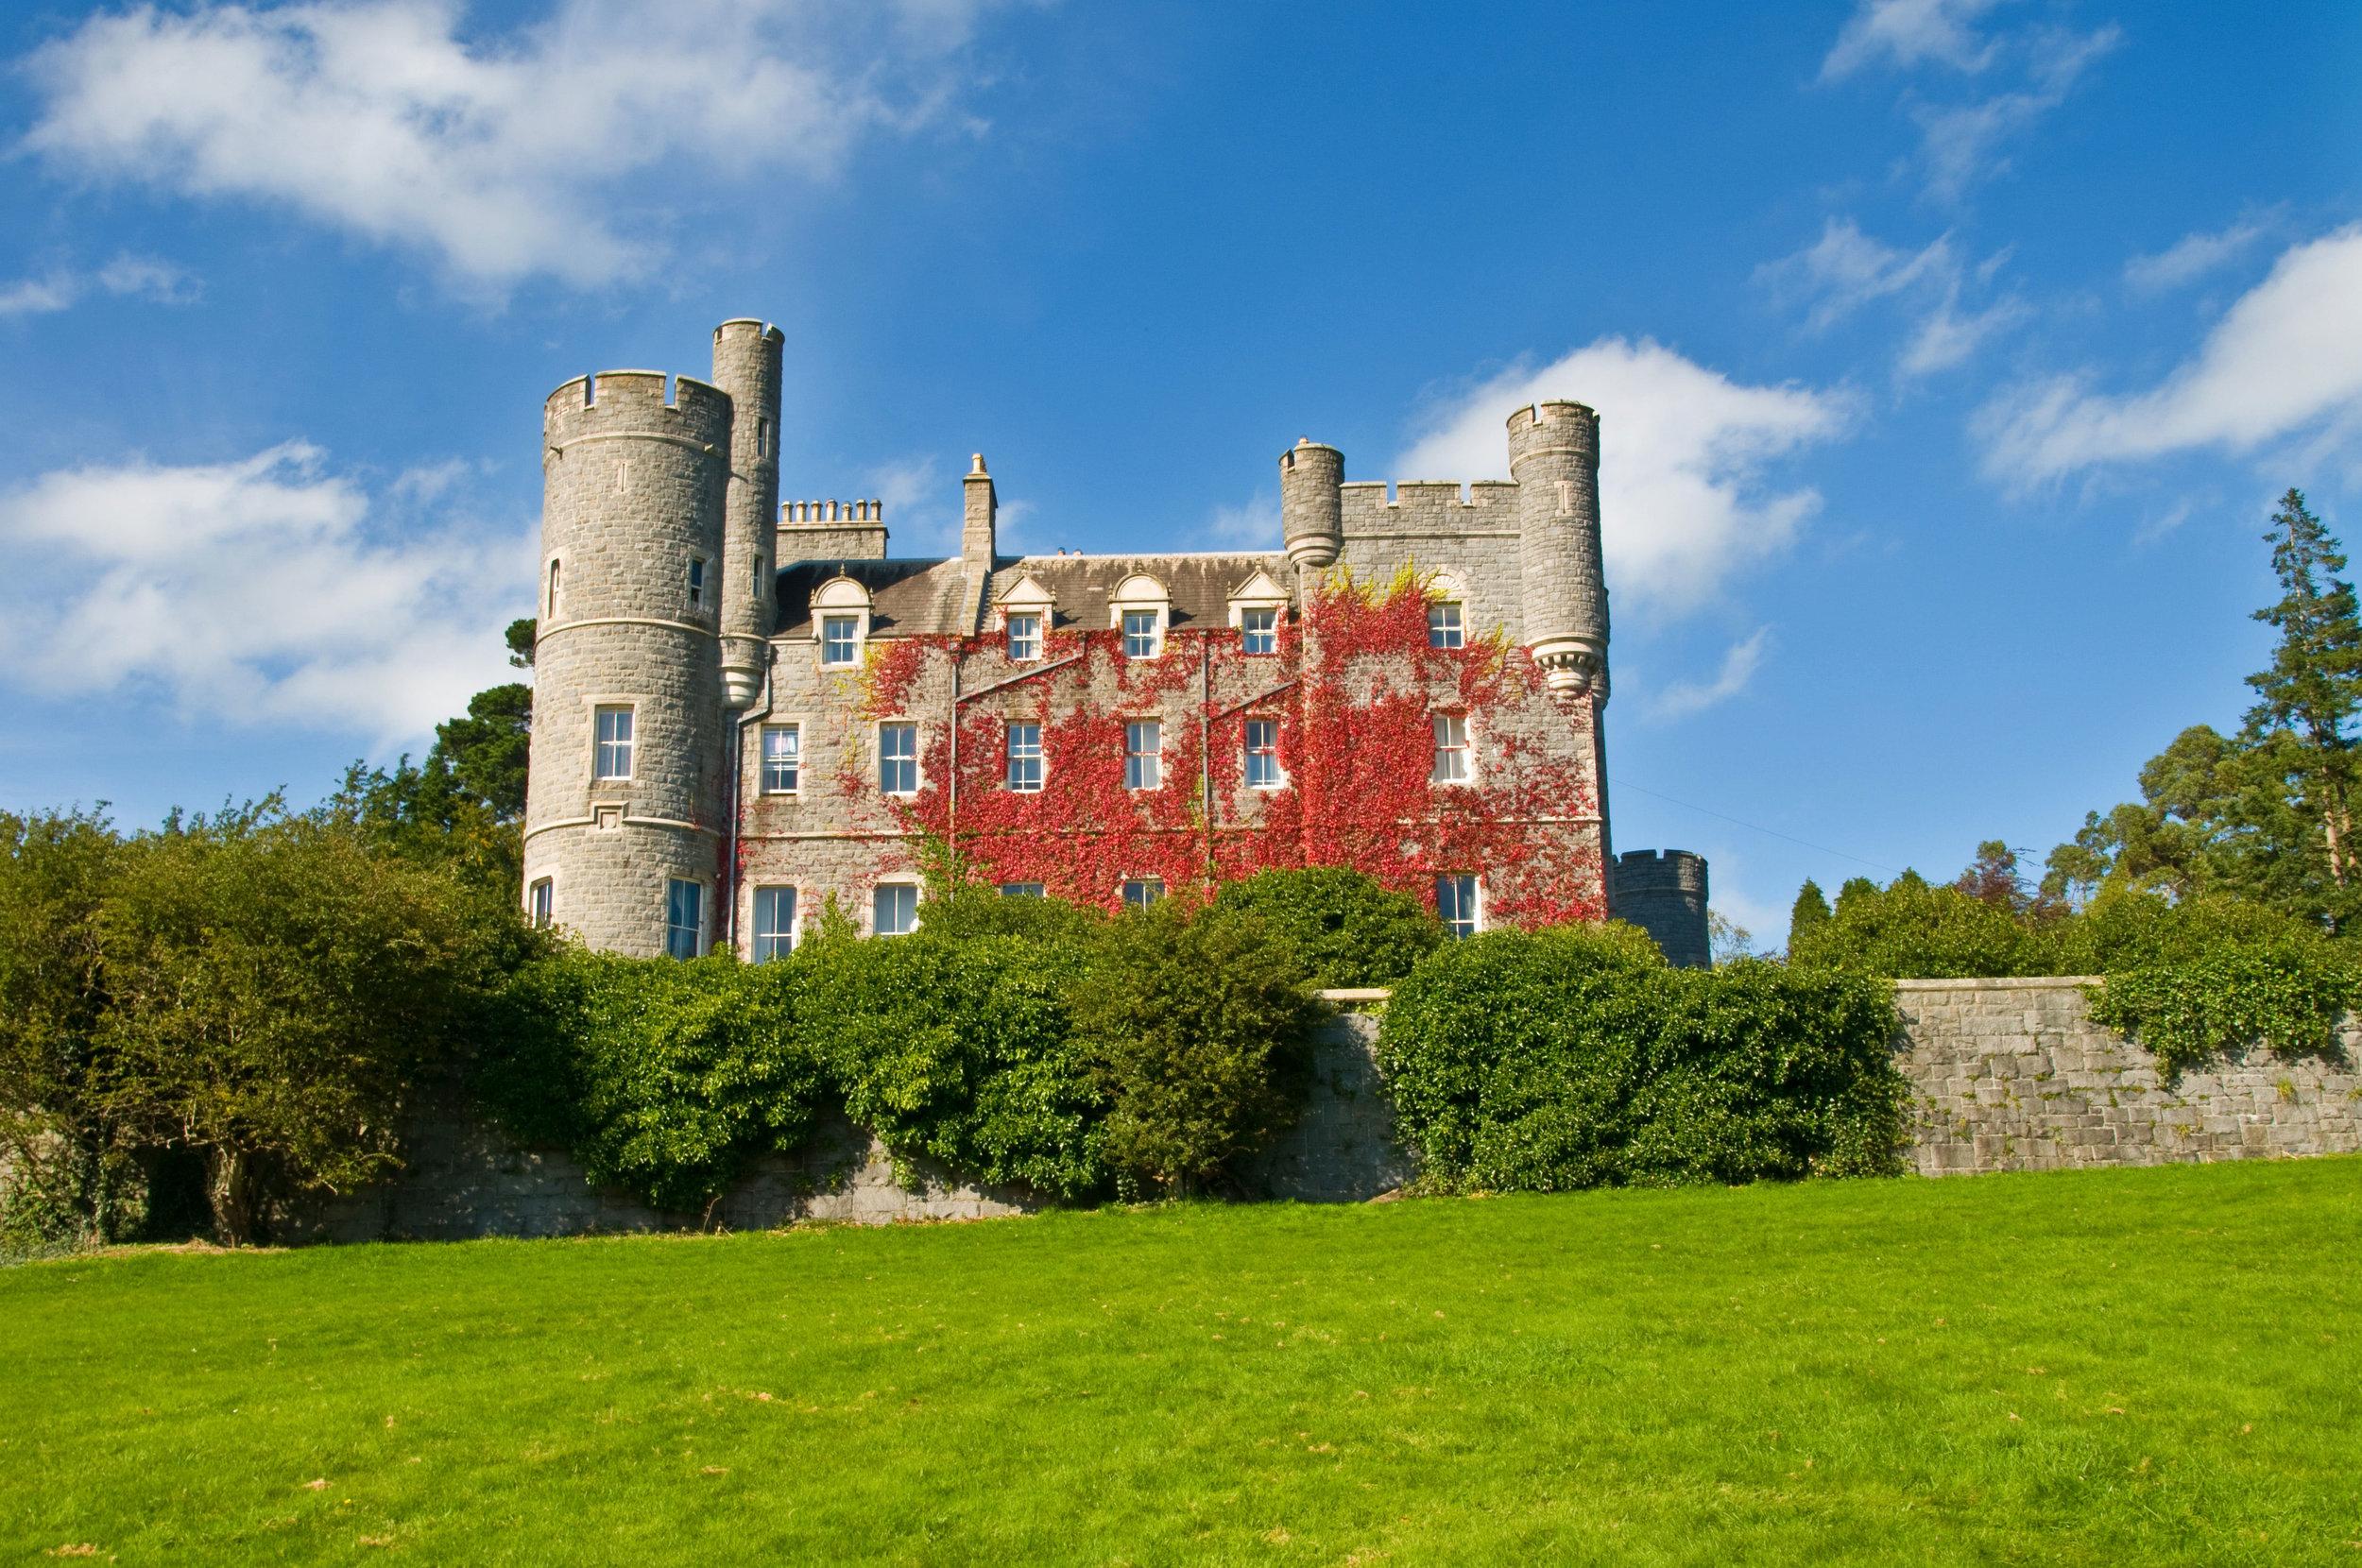 The_castle_in_Castlewellan_forest_park.jpg